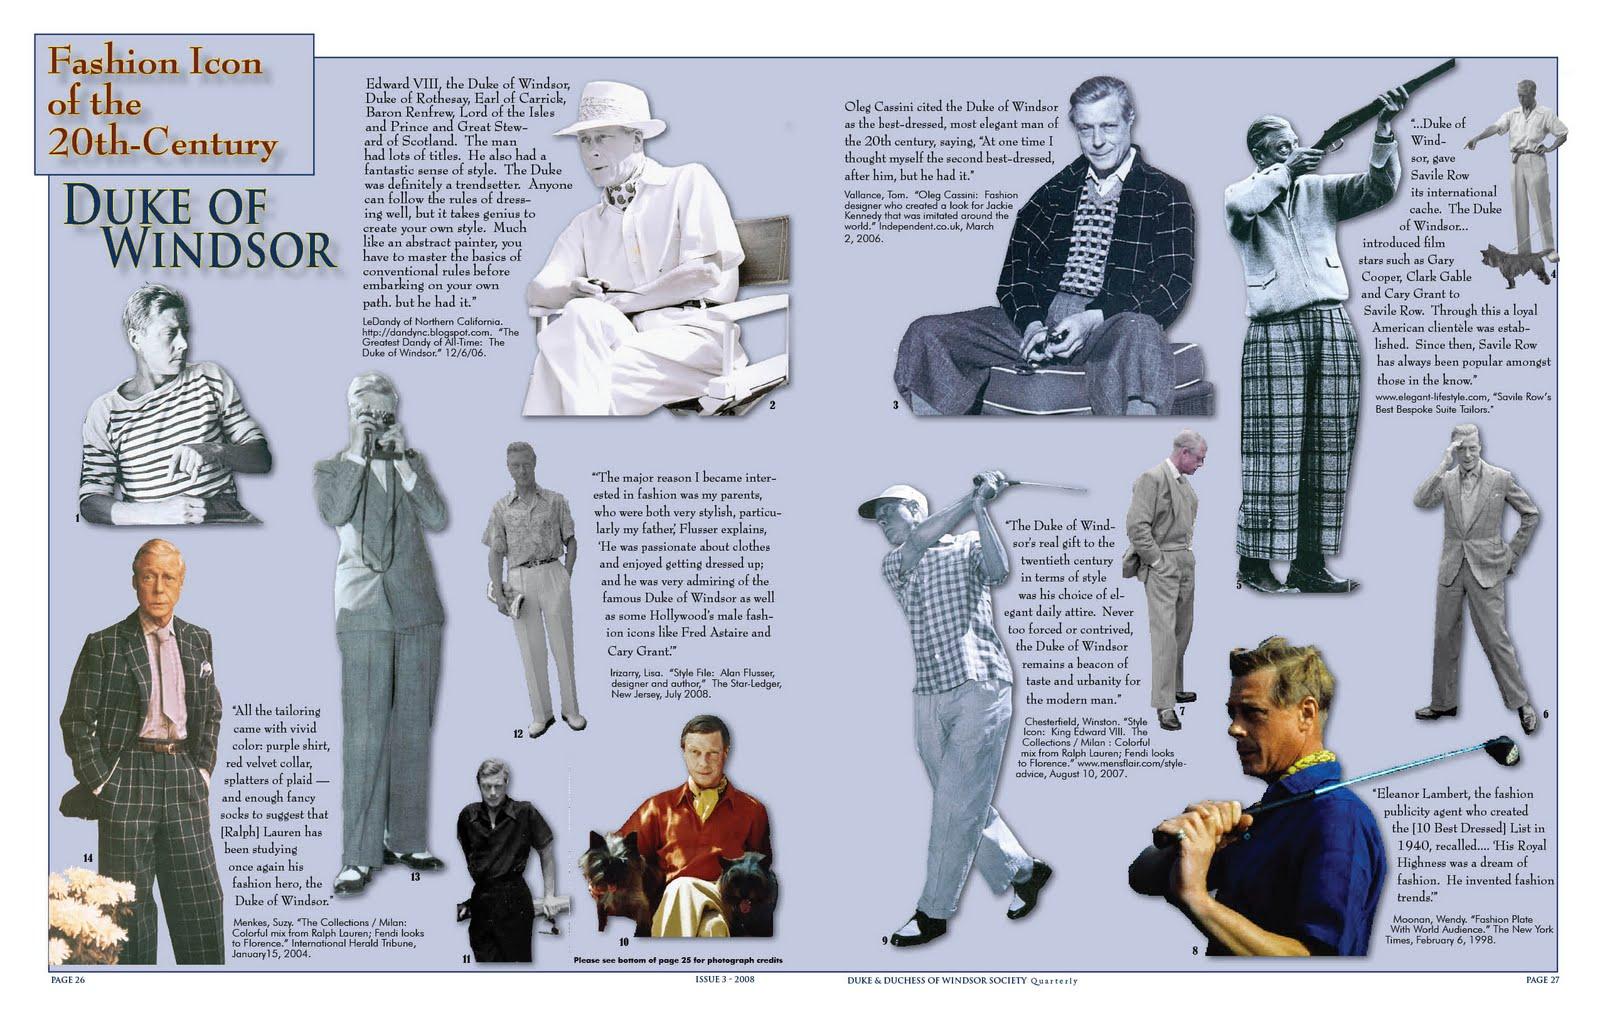 The_Duke_of_Windsor_style_icon_at_Keikari_dot_com